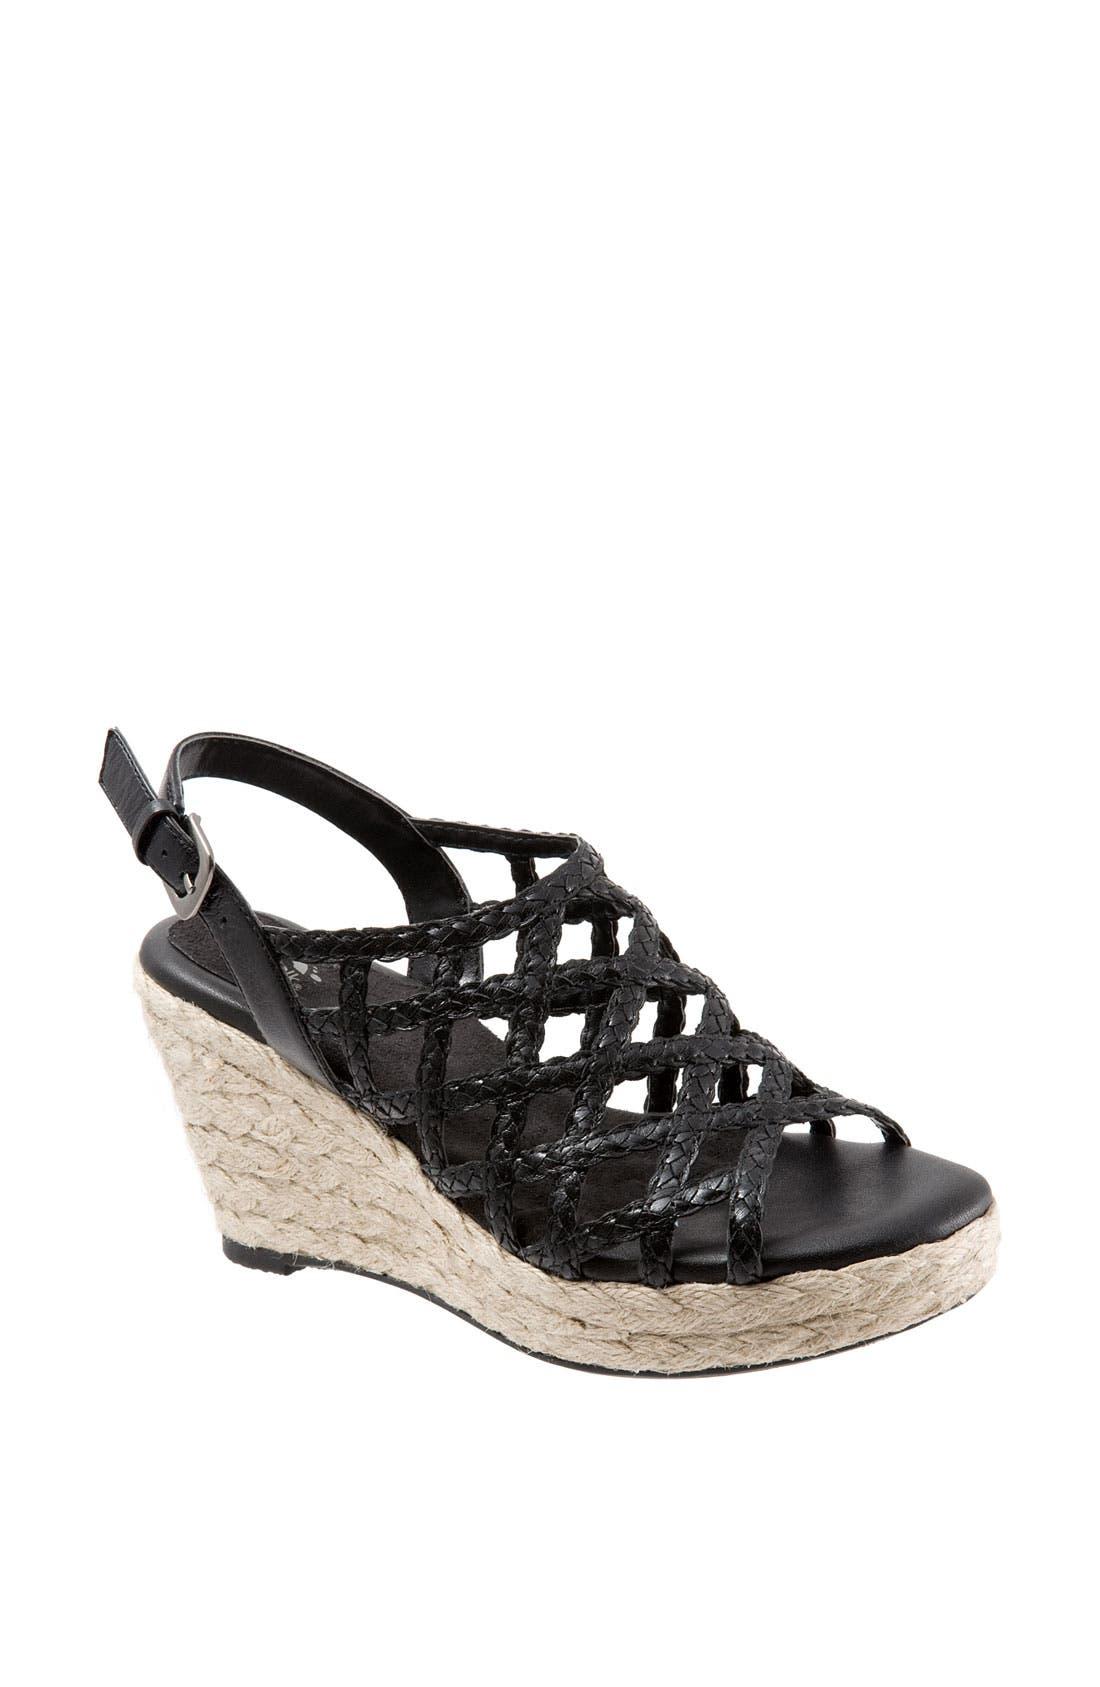 Main Image - SoftWalk® 'St. Croix' Sandal